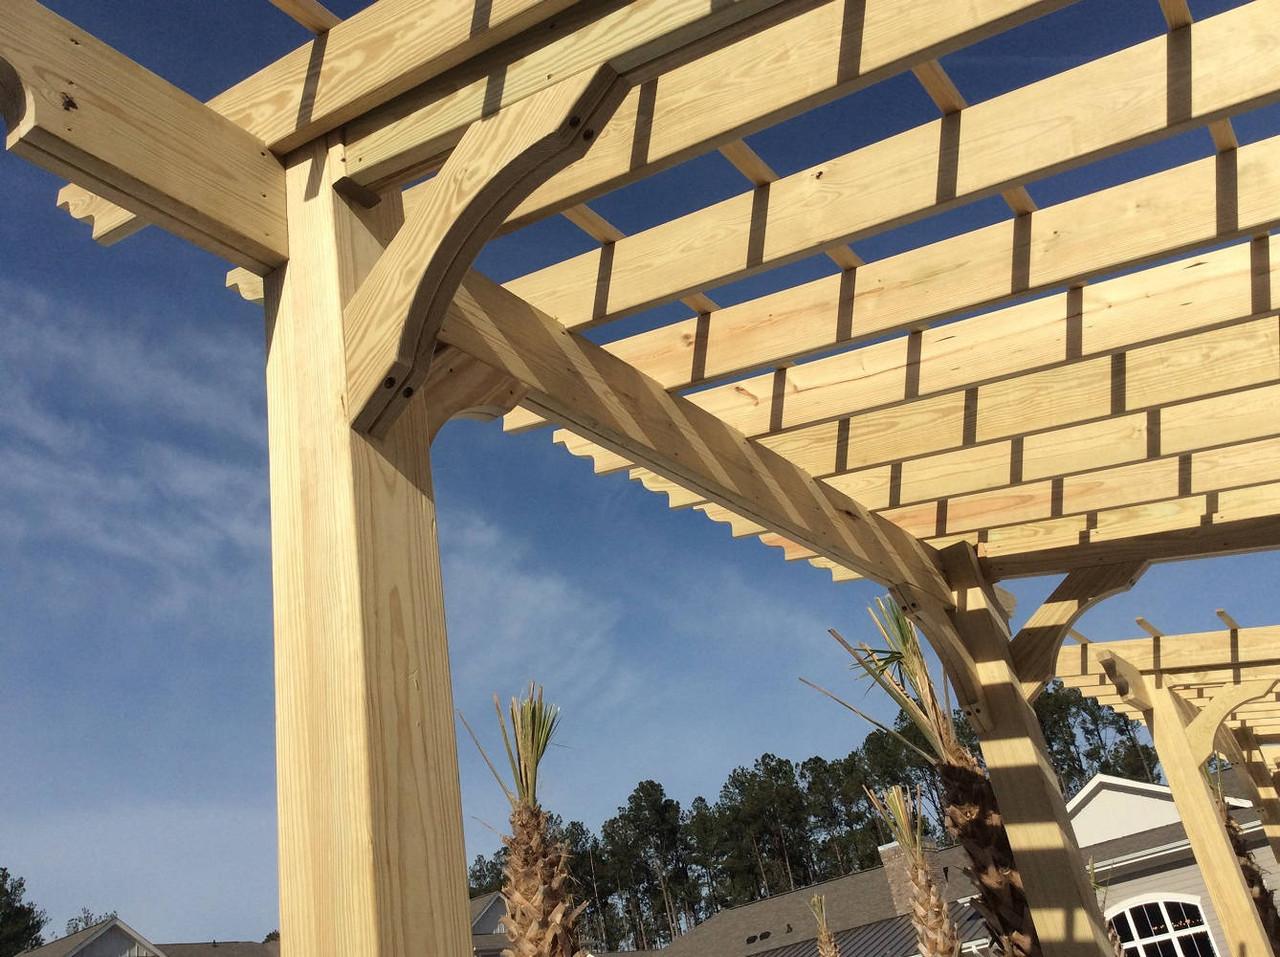 Corner Detail of 10x10 Classic Slant Roof Pressure Treated Pine Pergola Kit, Summerville, SC